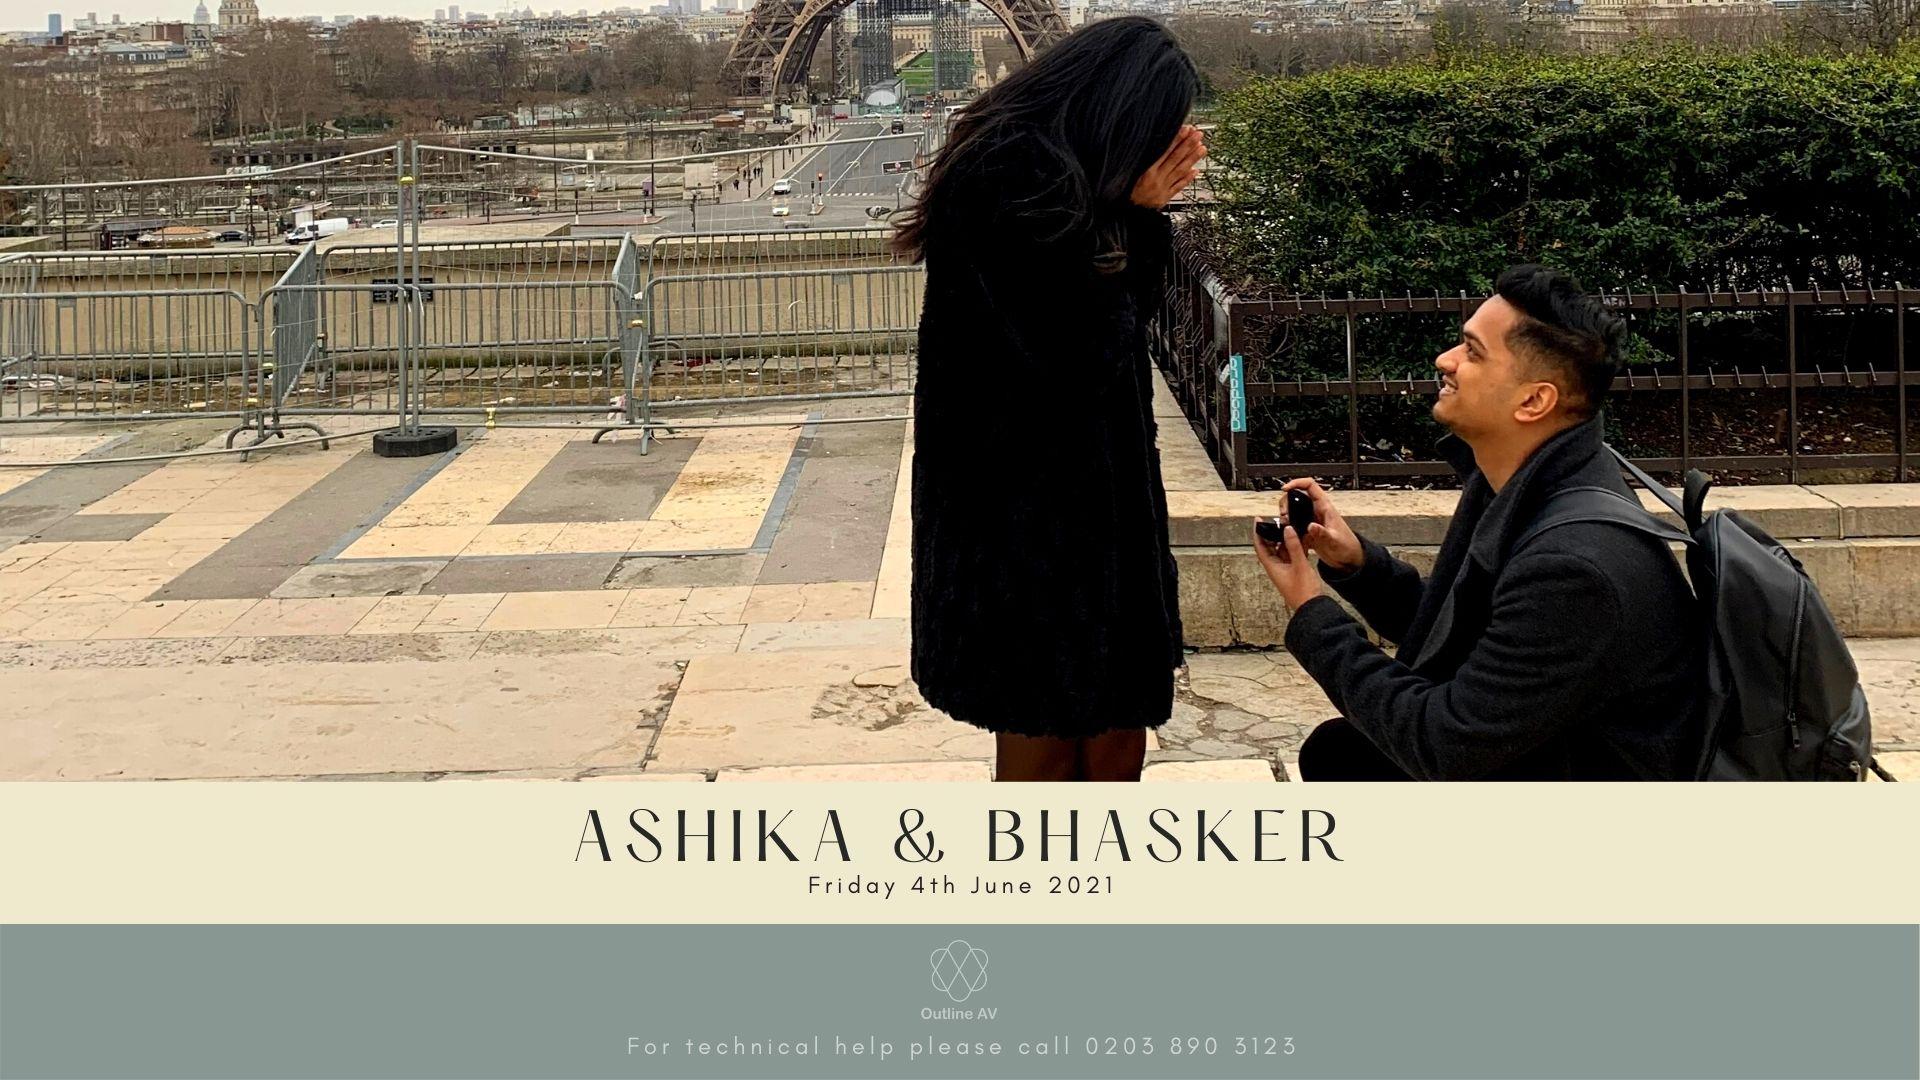 Ashika & Bhasker - Live Stream